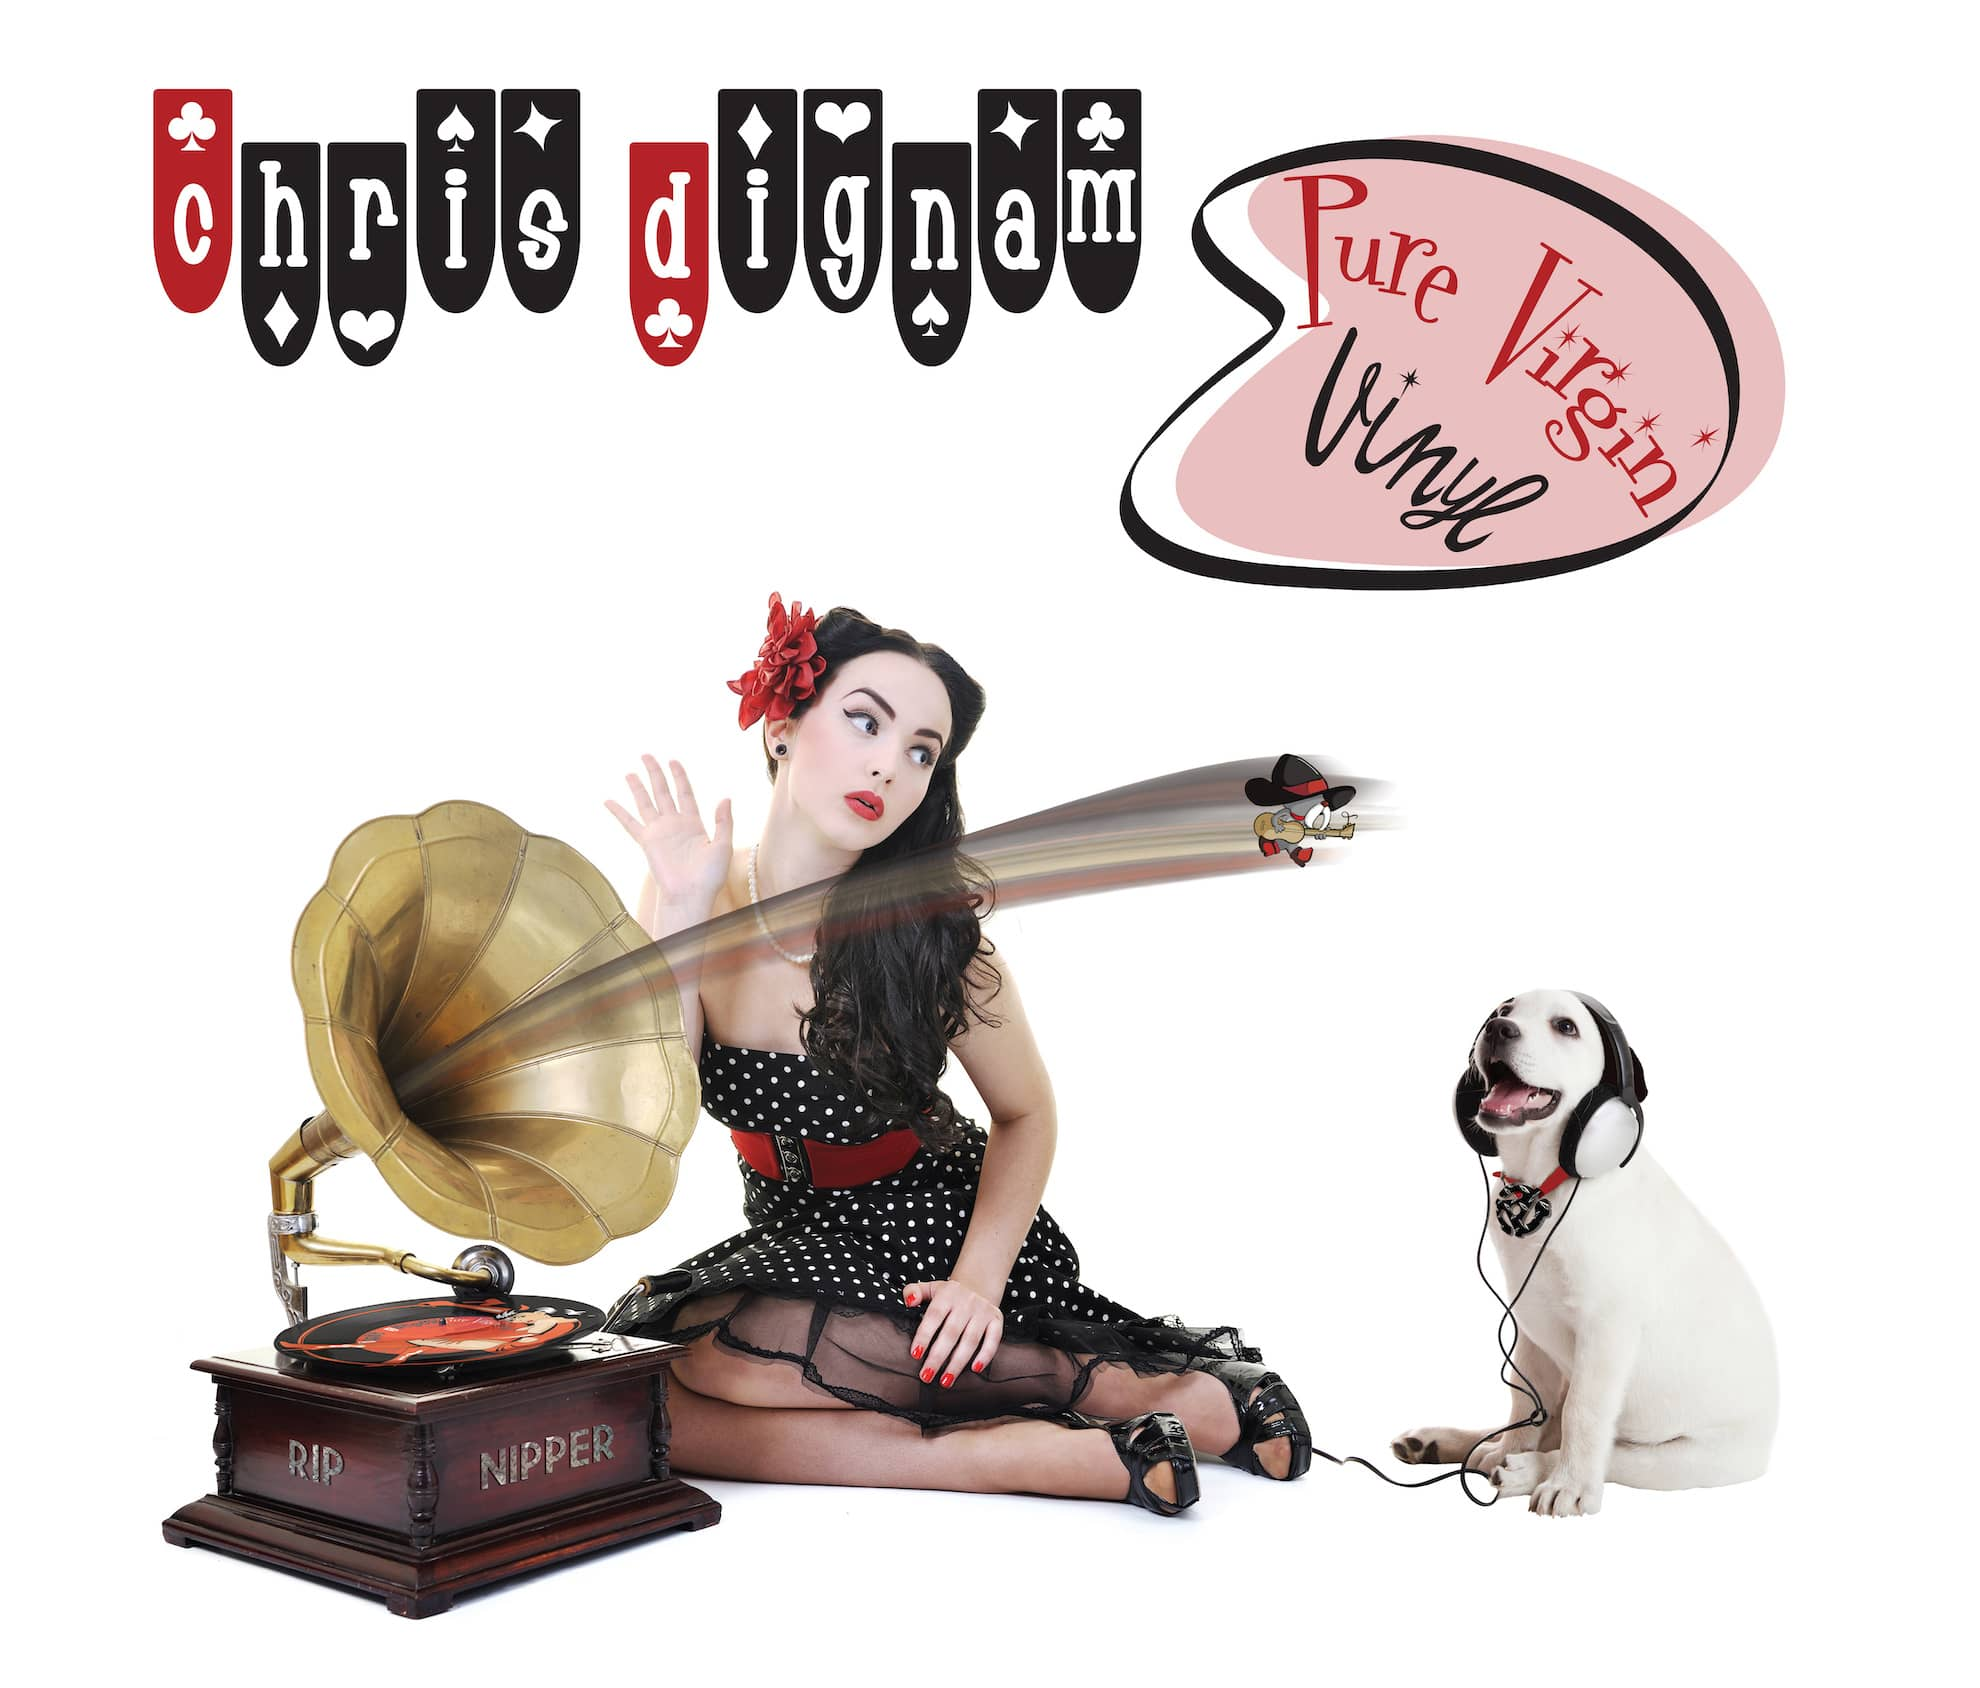 Pure VIrgin Vinyl Front Cover